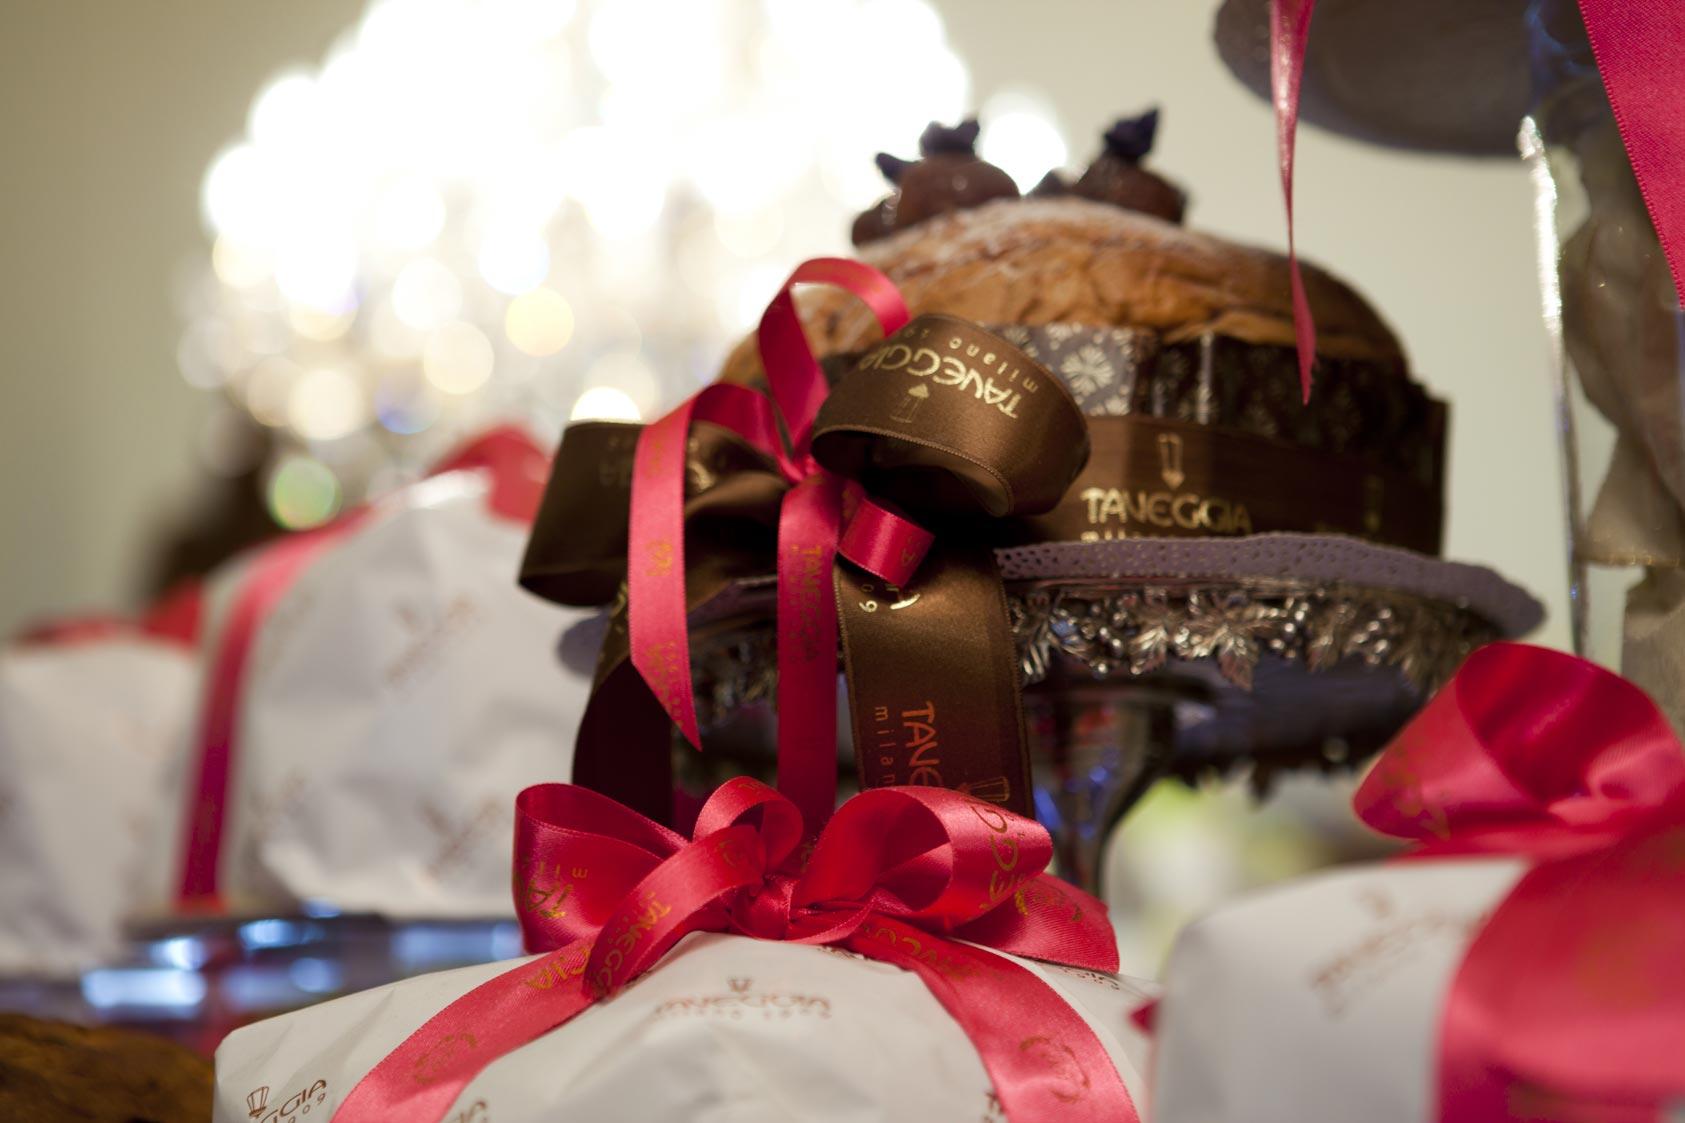 panettone artigianale pasticceria taveggia milano